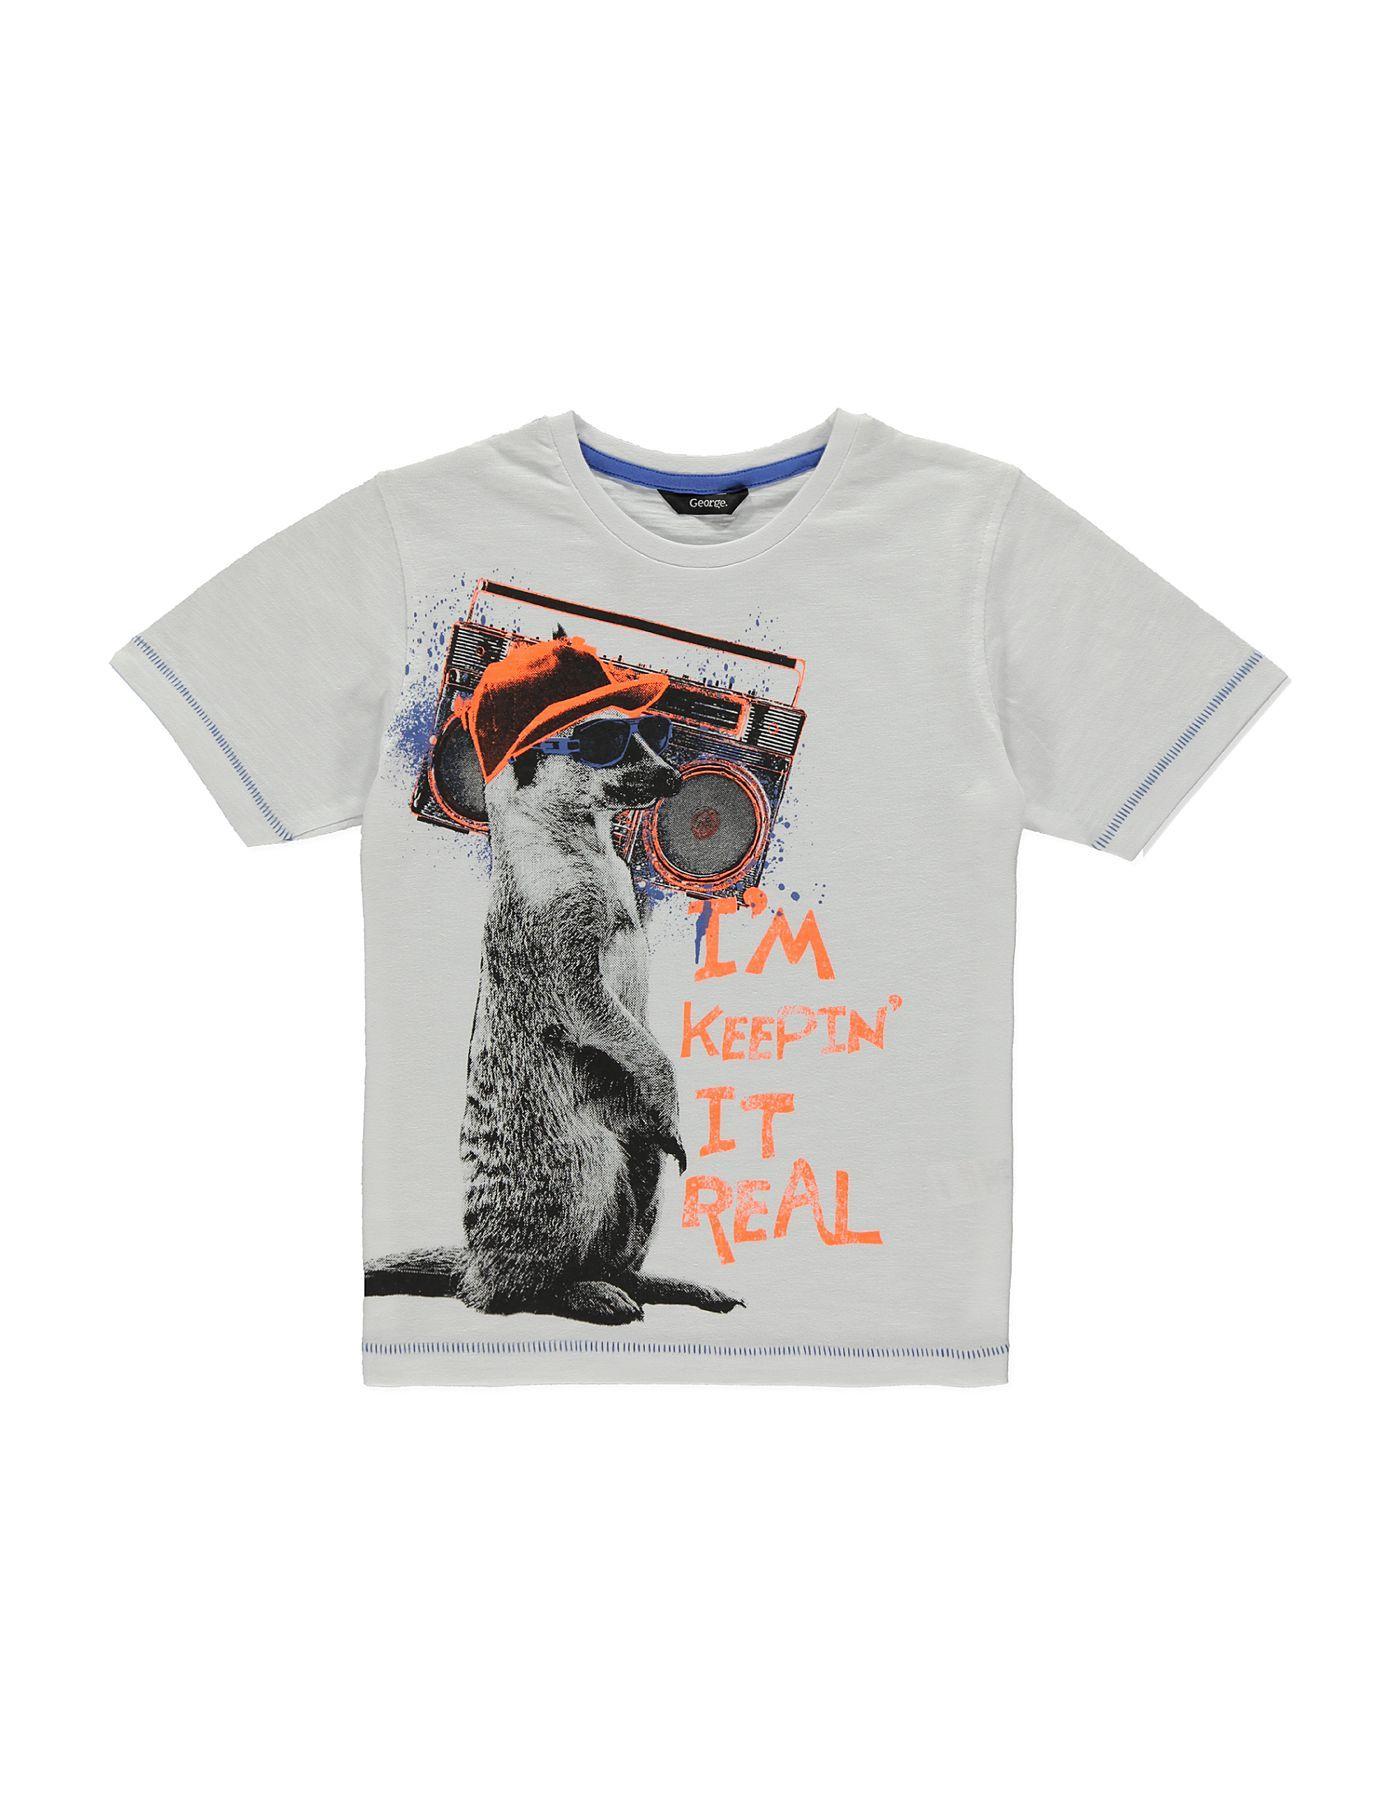 Black t shirt asda - Meerkat Print T Shirt Boys George At Asda